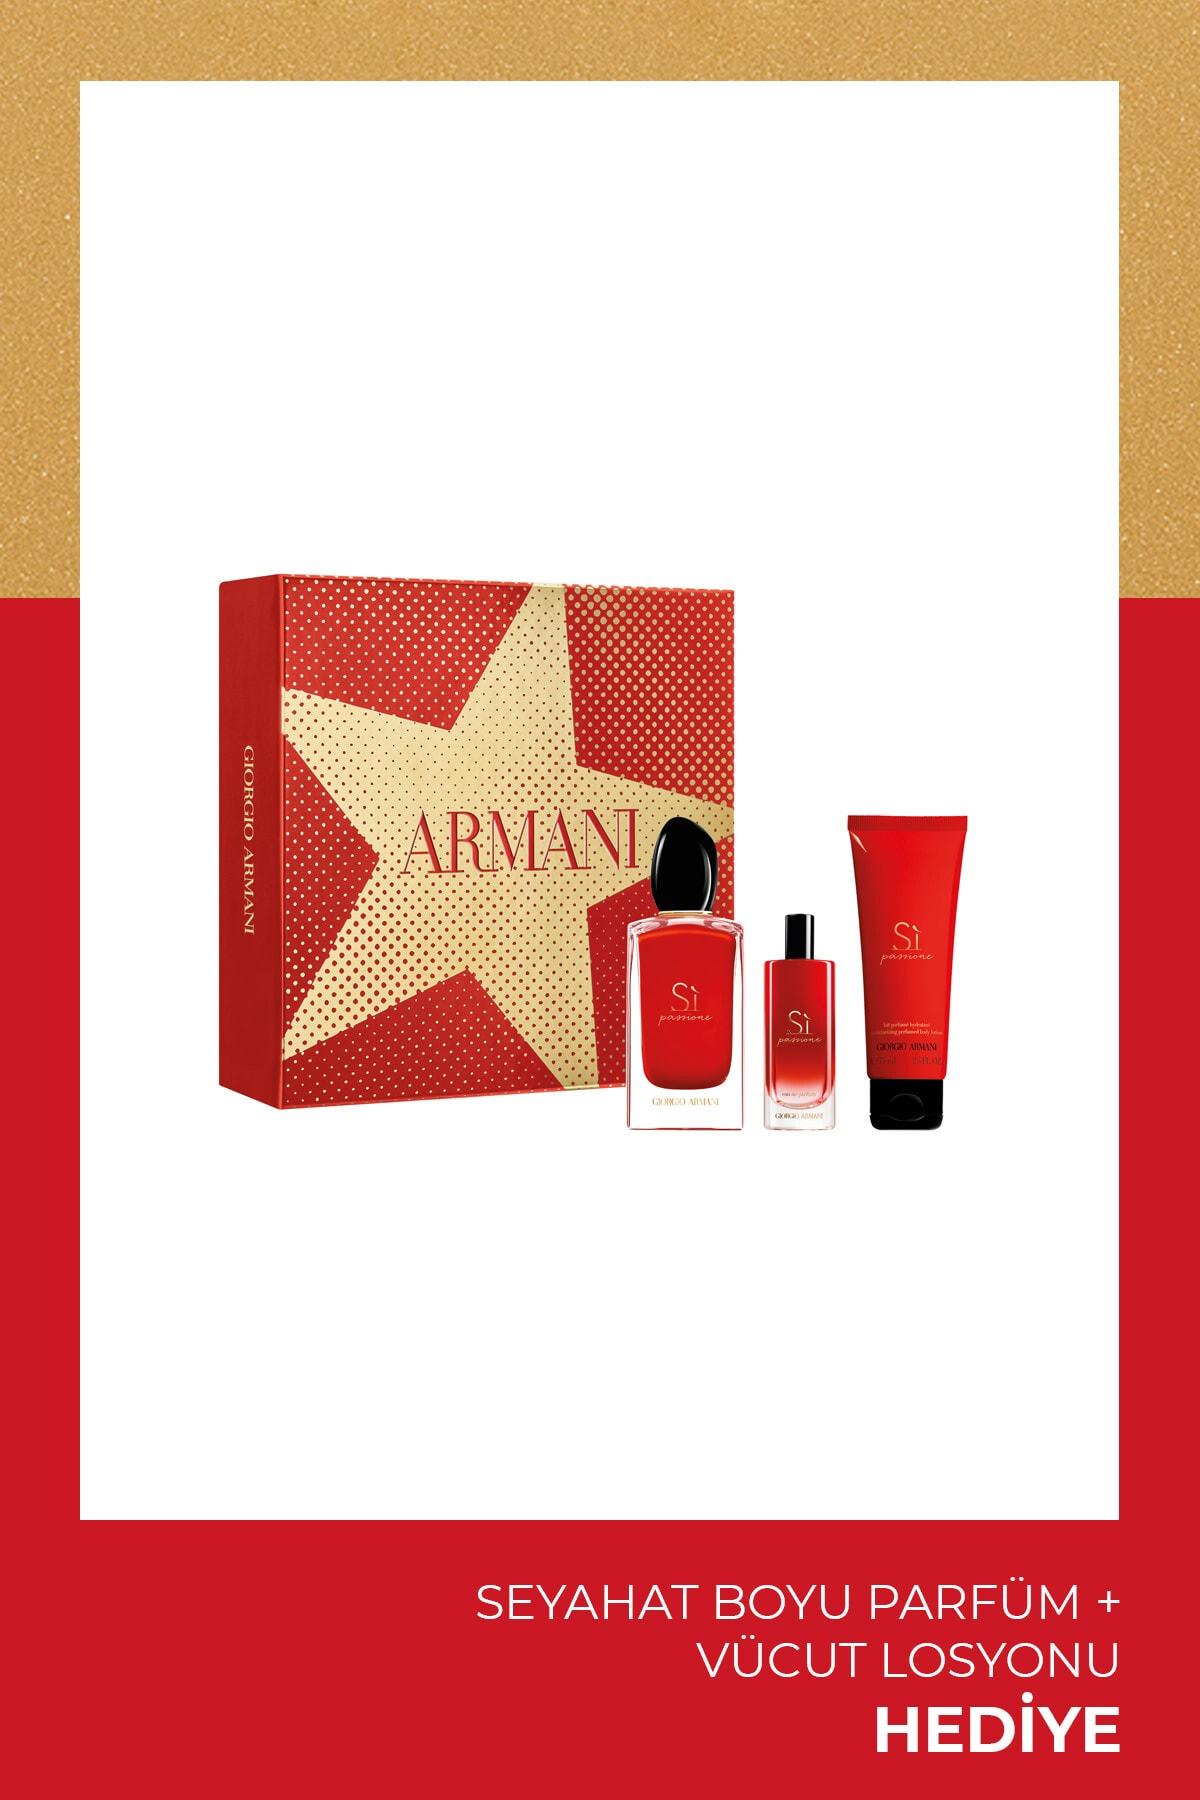 Giorgio Armani Si Passione Kadin Parfüm Seti 100 ml 3614272762077 1